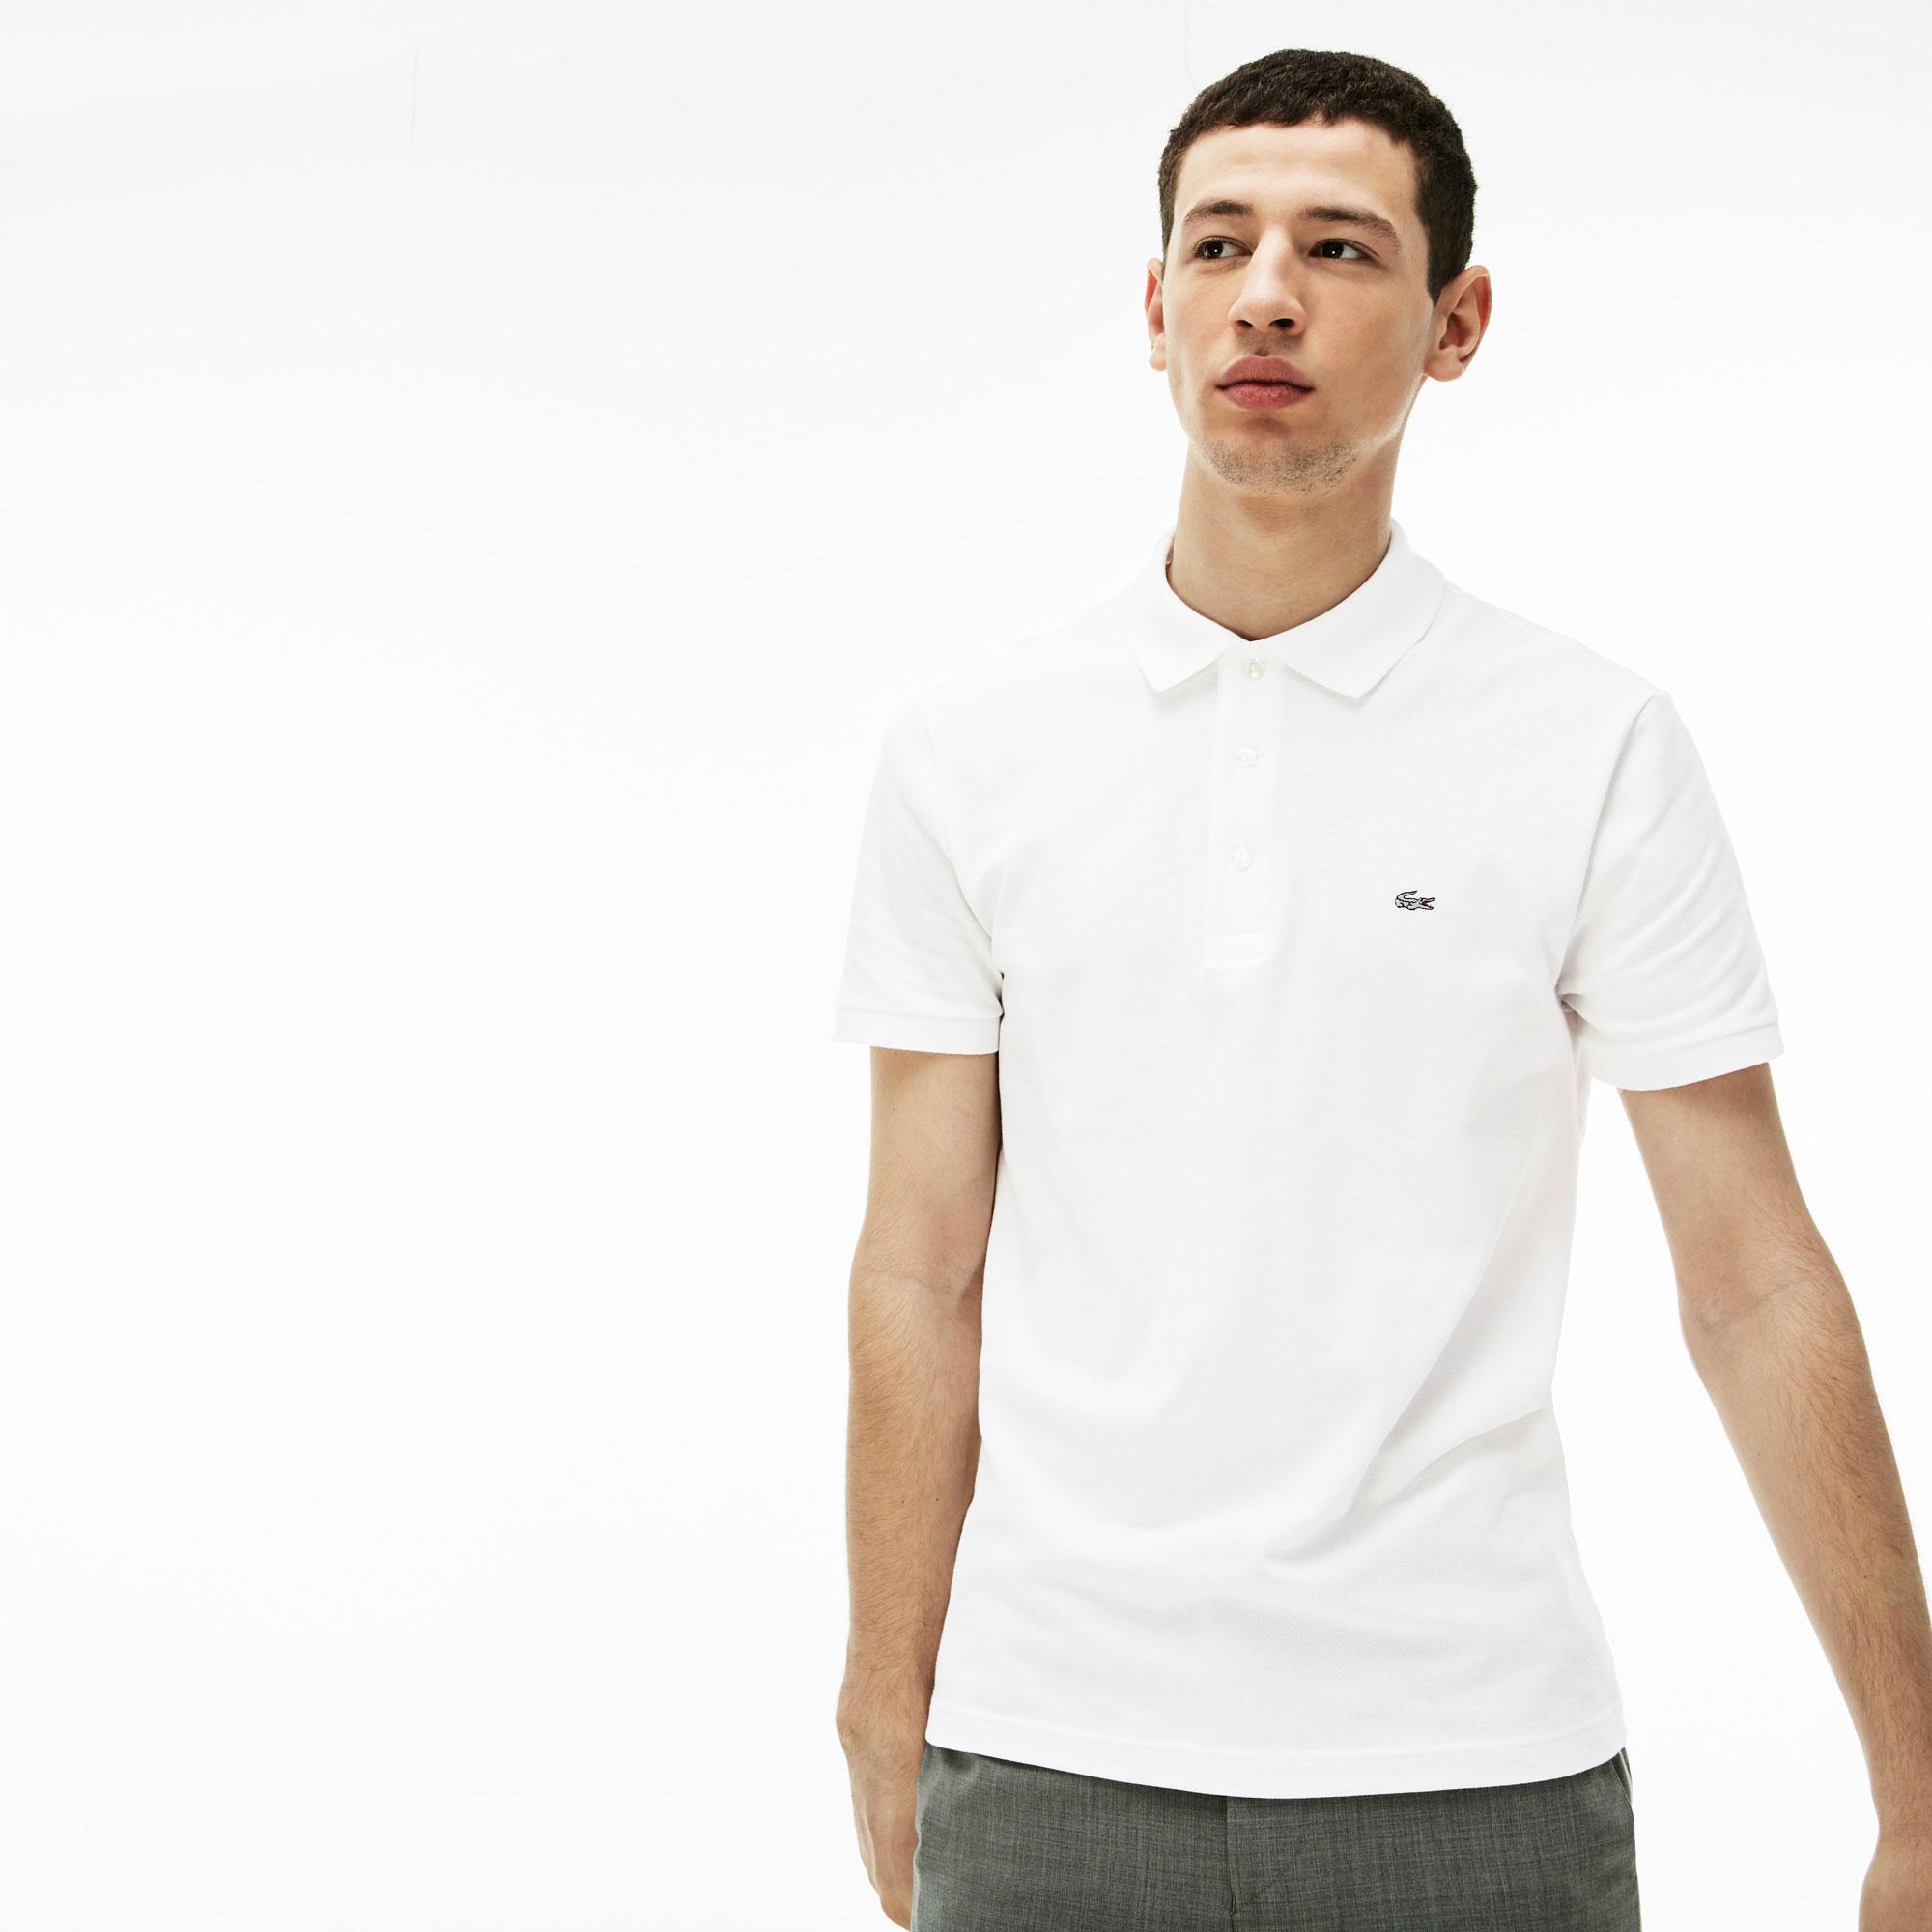 Lacoste Męska Elastyczna Koszulka Polo Slim Fit Z Drobnej Piki